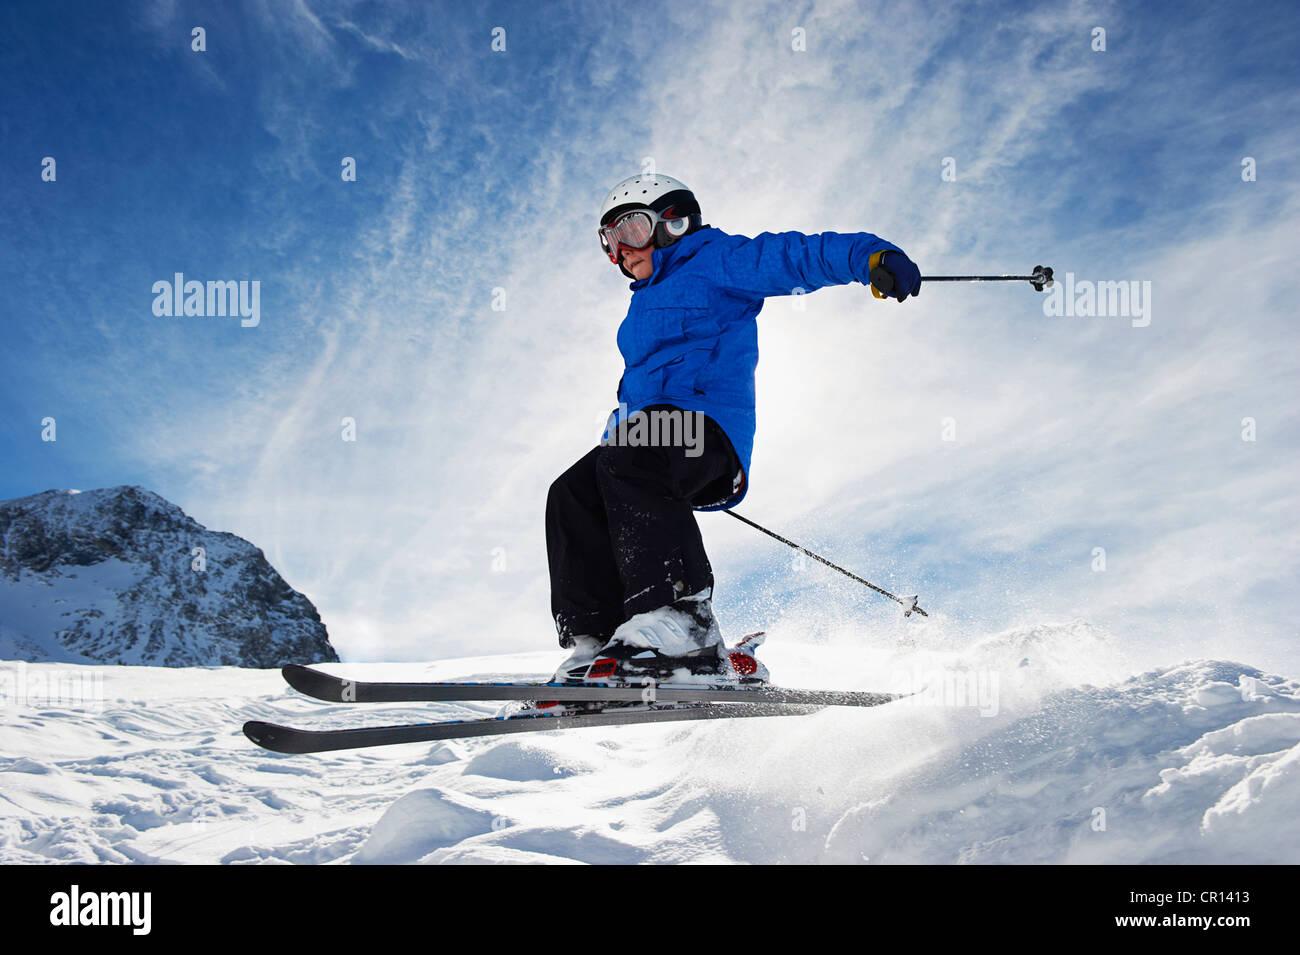 Boy skiing on snowy mountainside - Stock Image